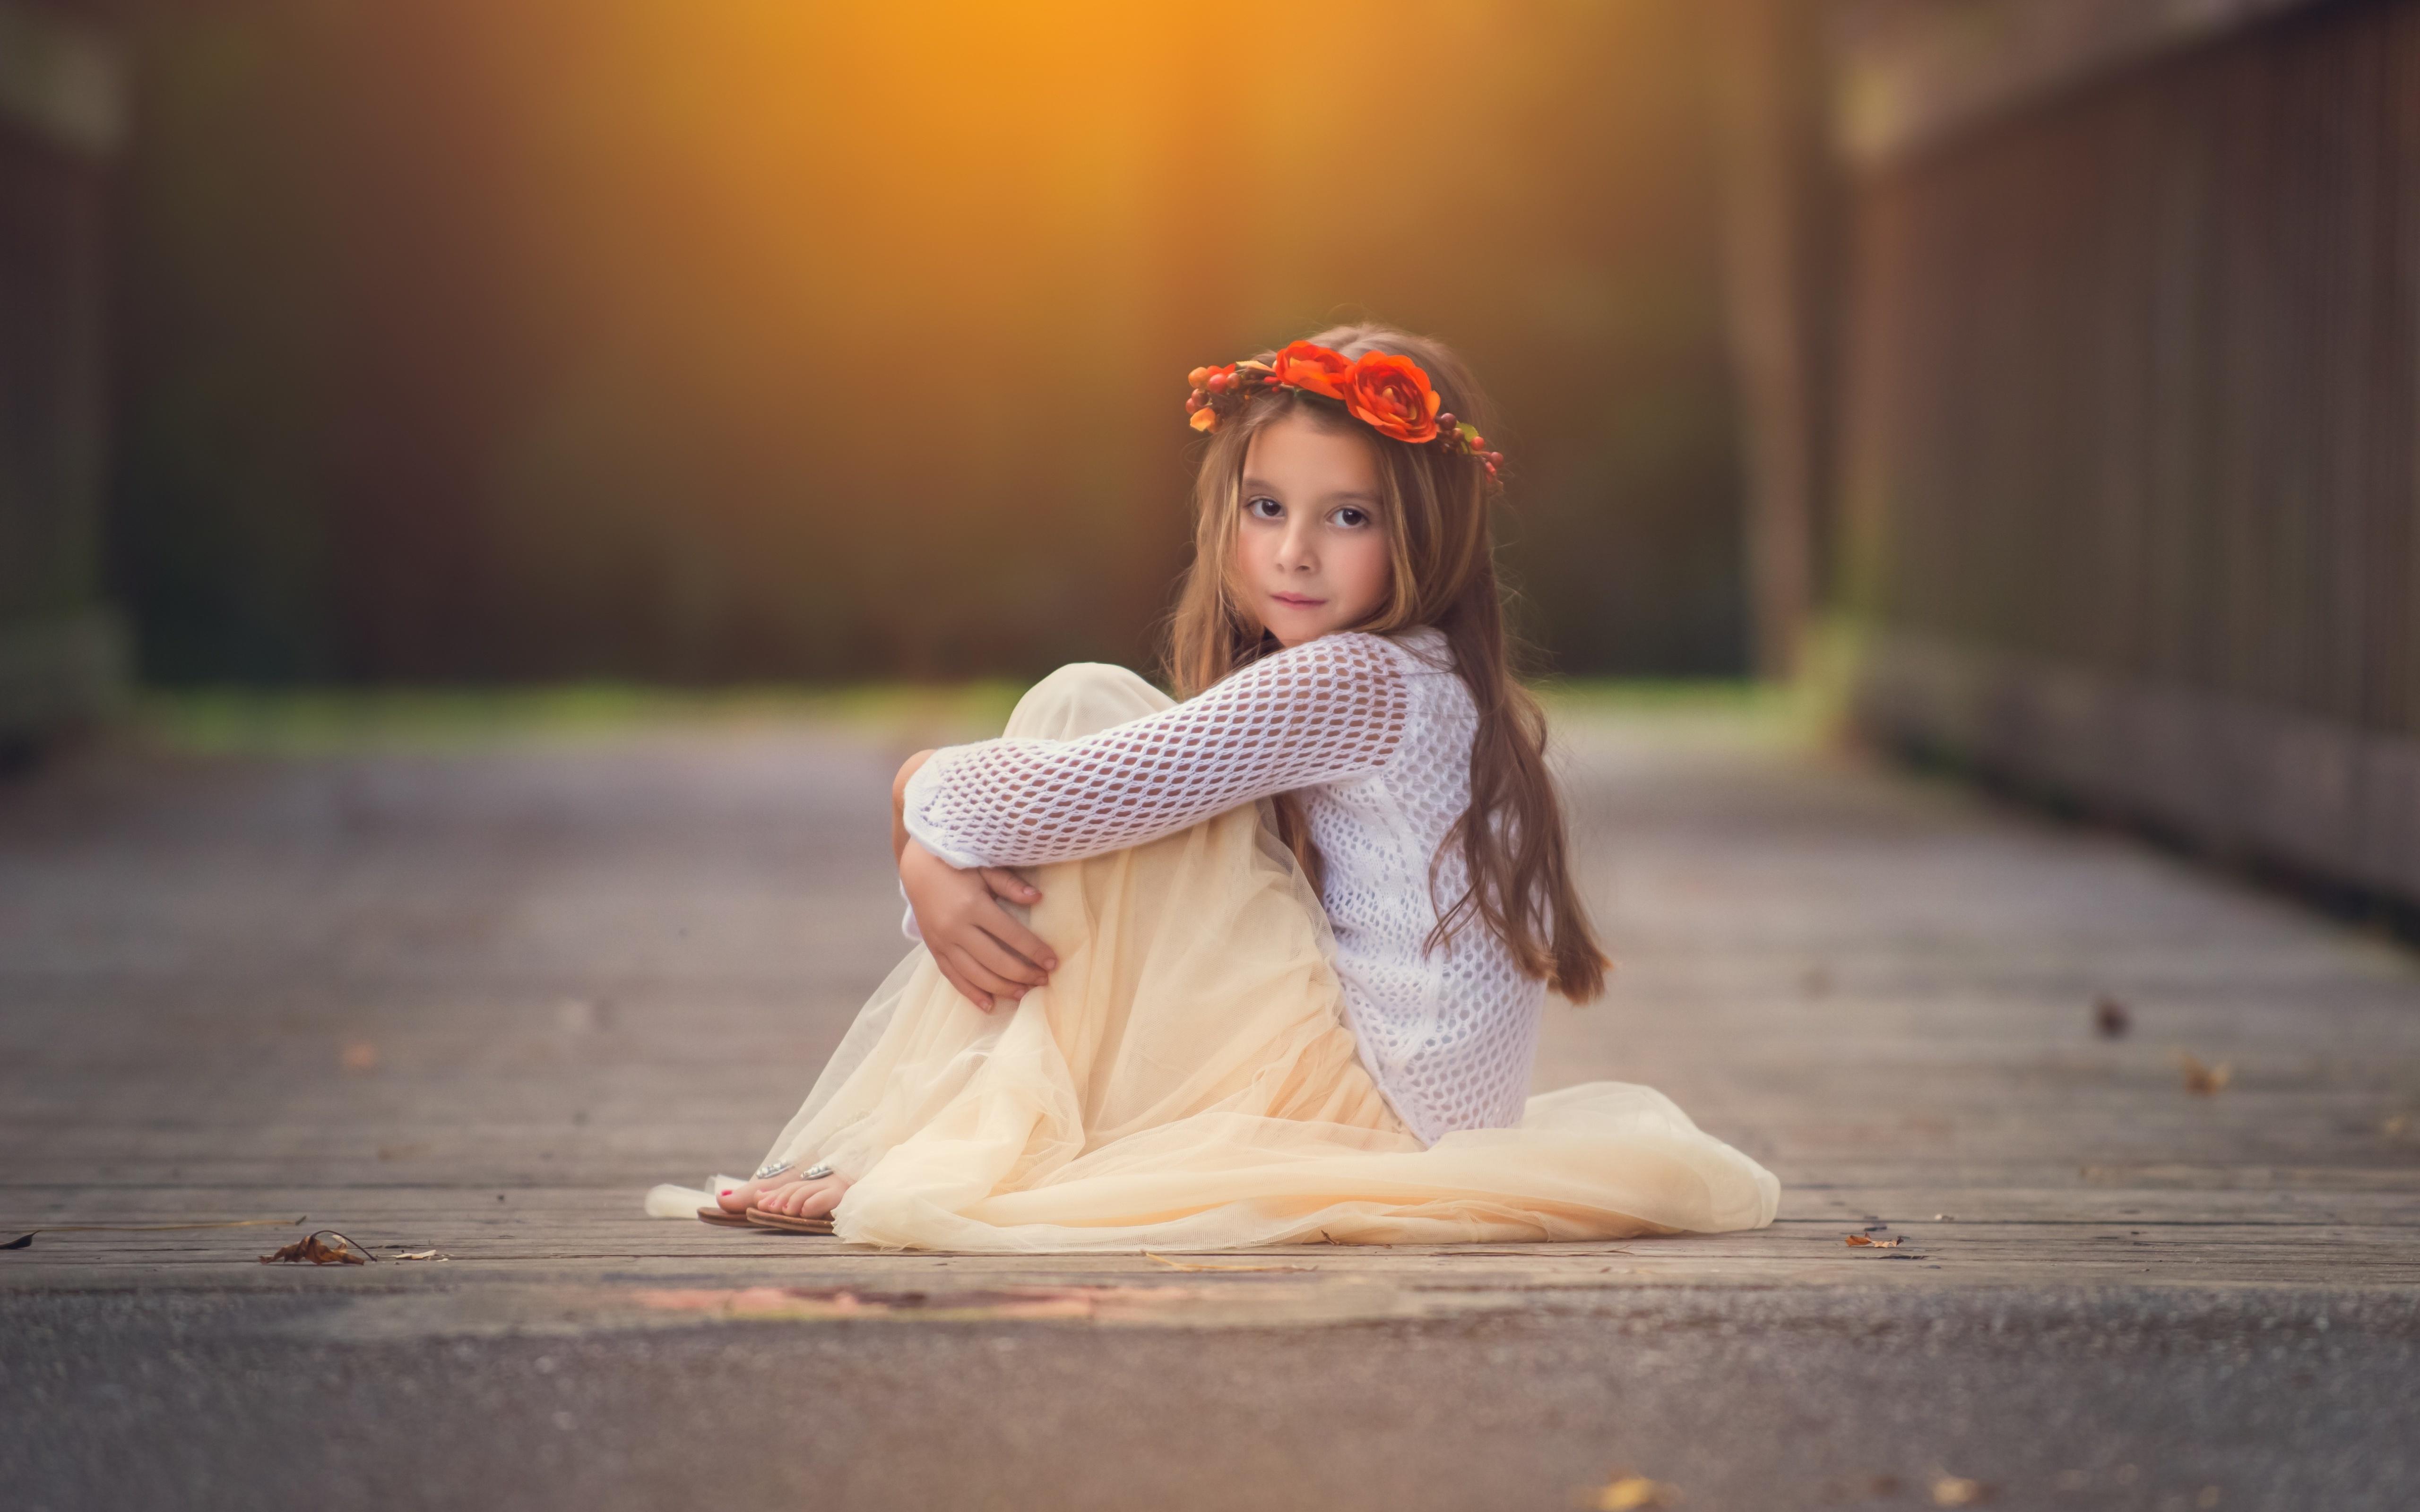 349 Little Girl HD Wallpapers